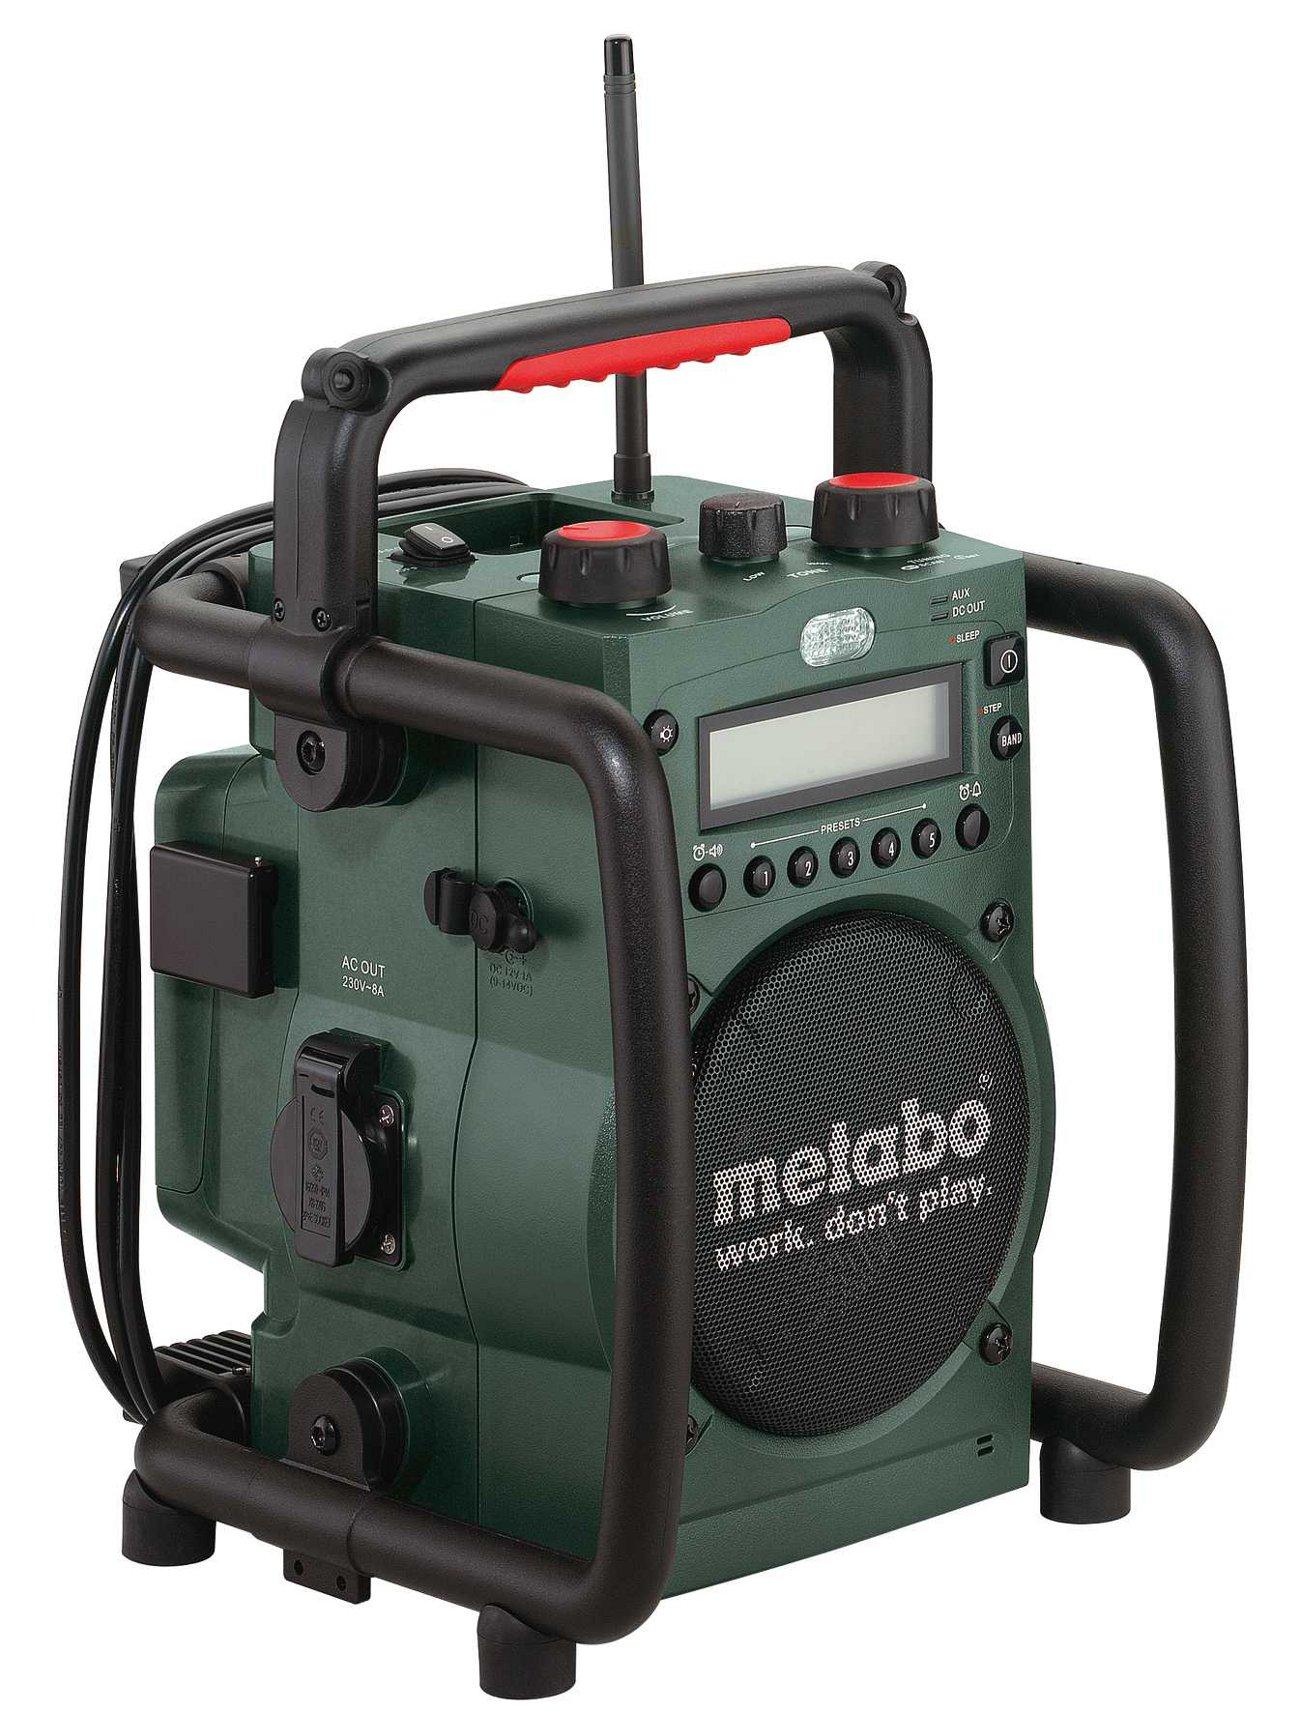 Радио Metabo Rc 14.4-18 (602106000)